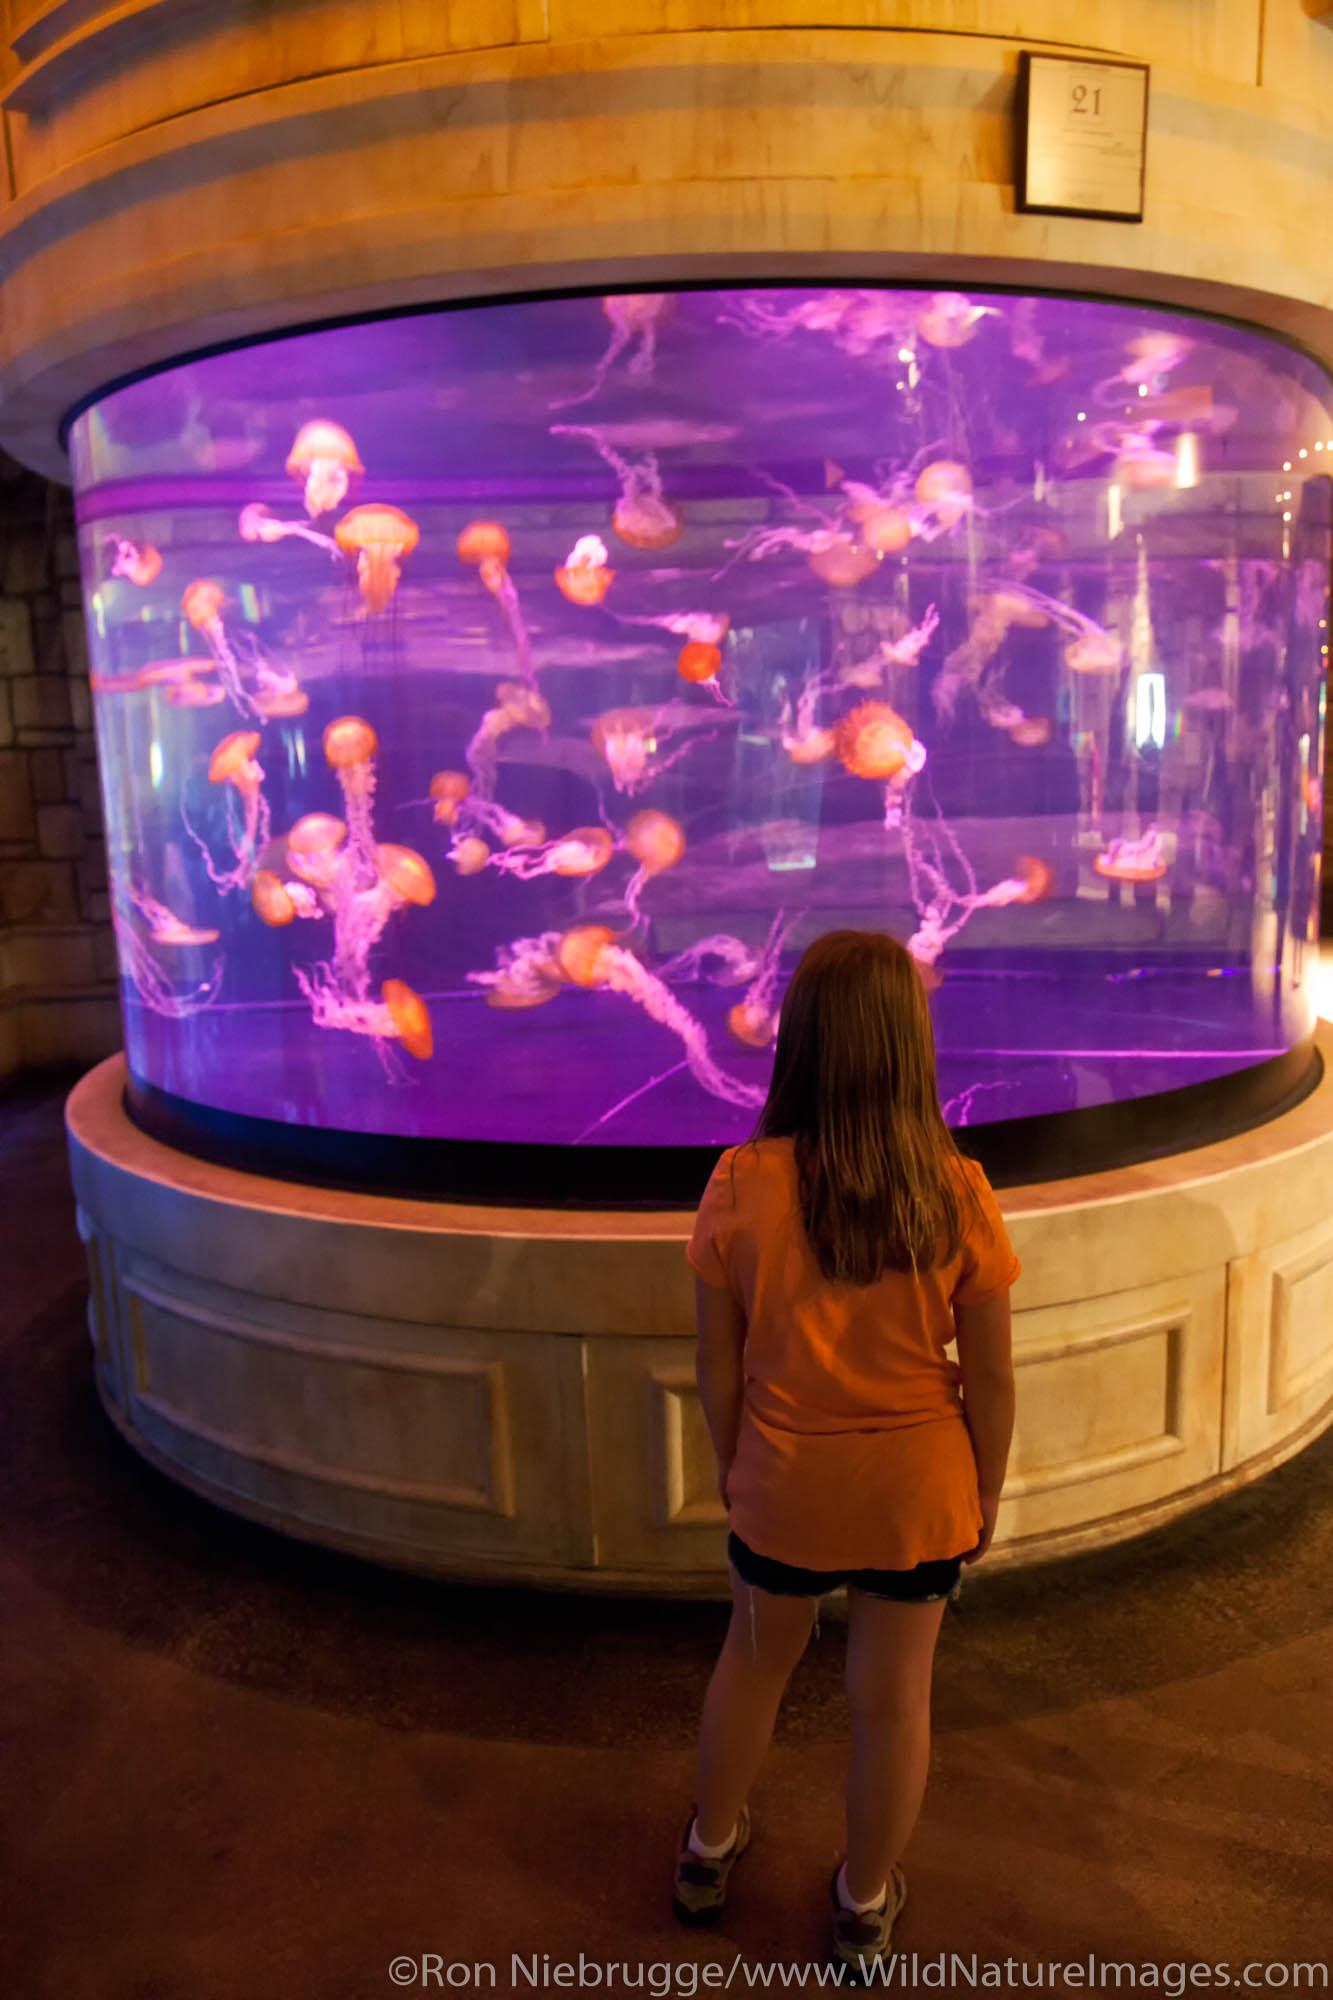 Shark Reef, Mandalay Bay Hotel and Casino, Las Vegas, Nevada (model released)